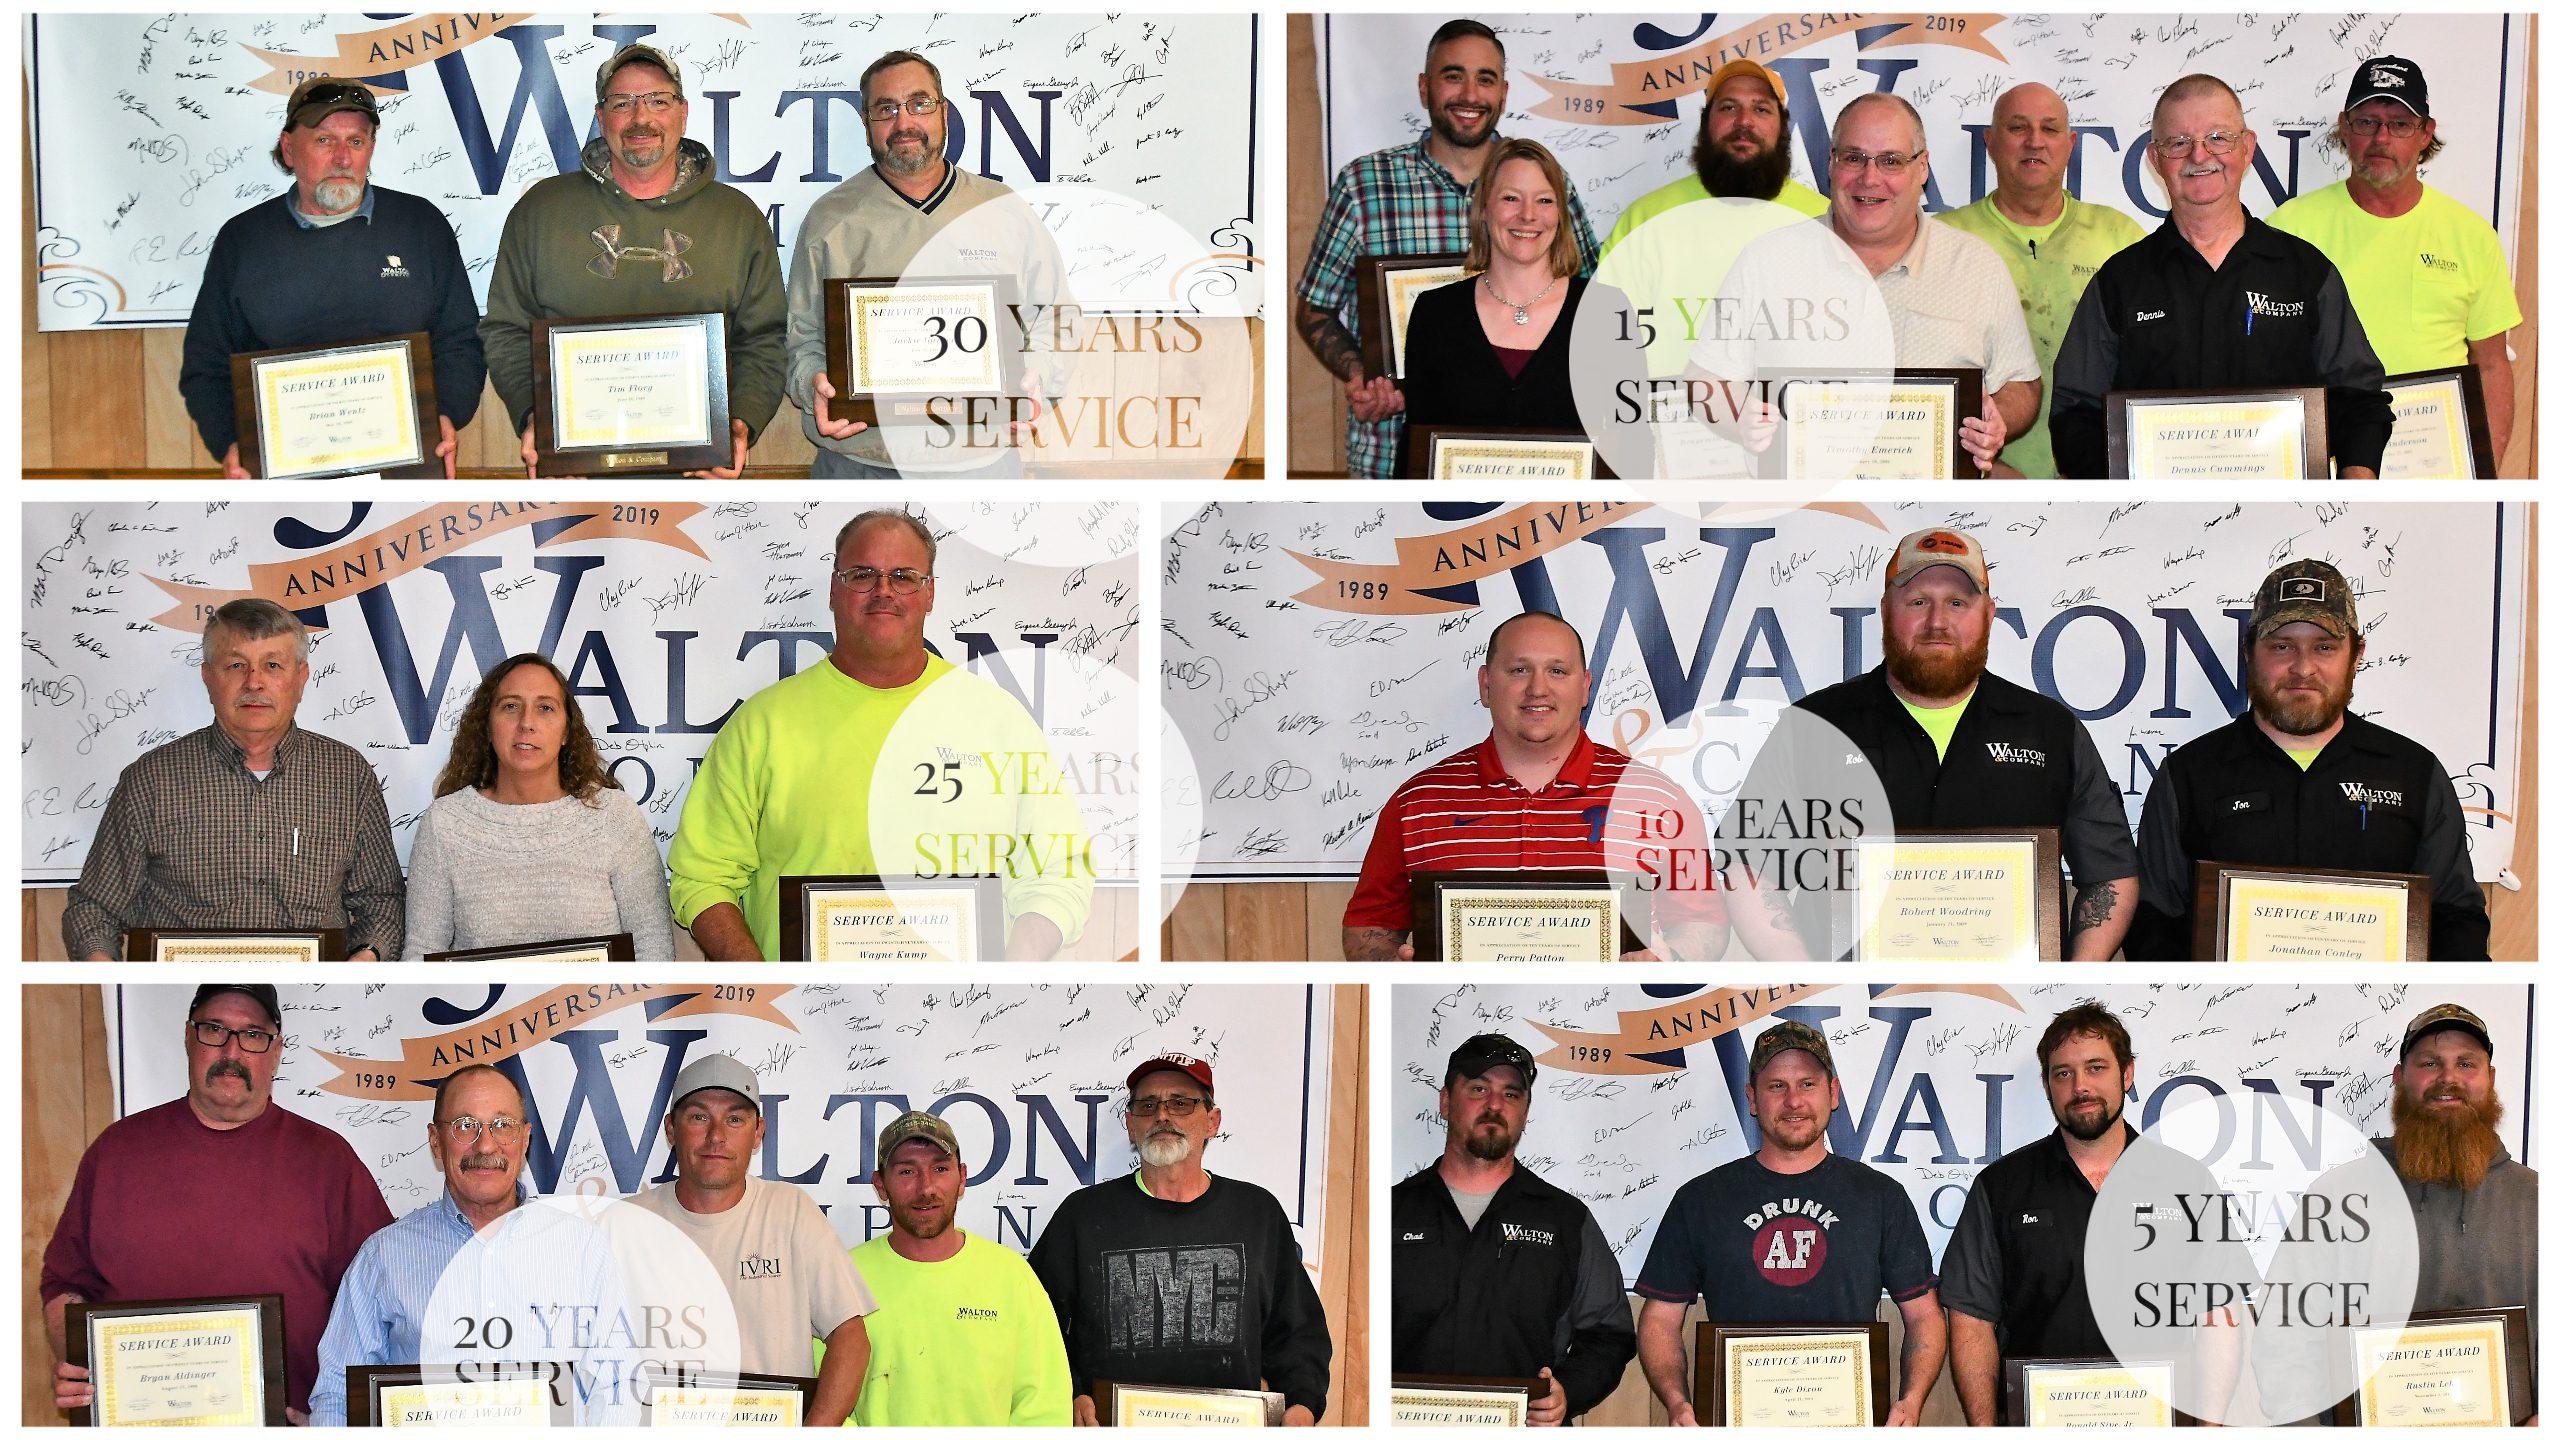 Walton and Company Service award recipients